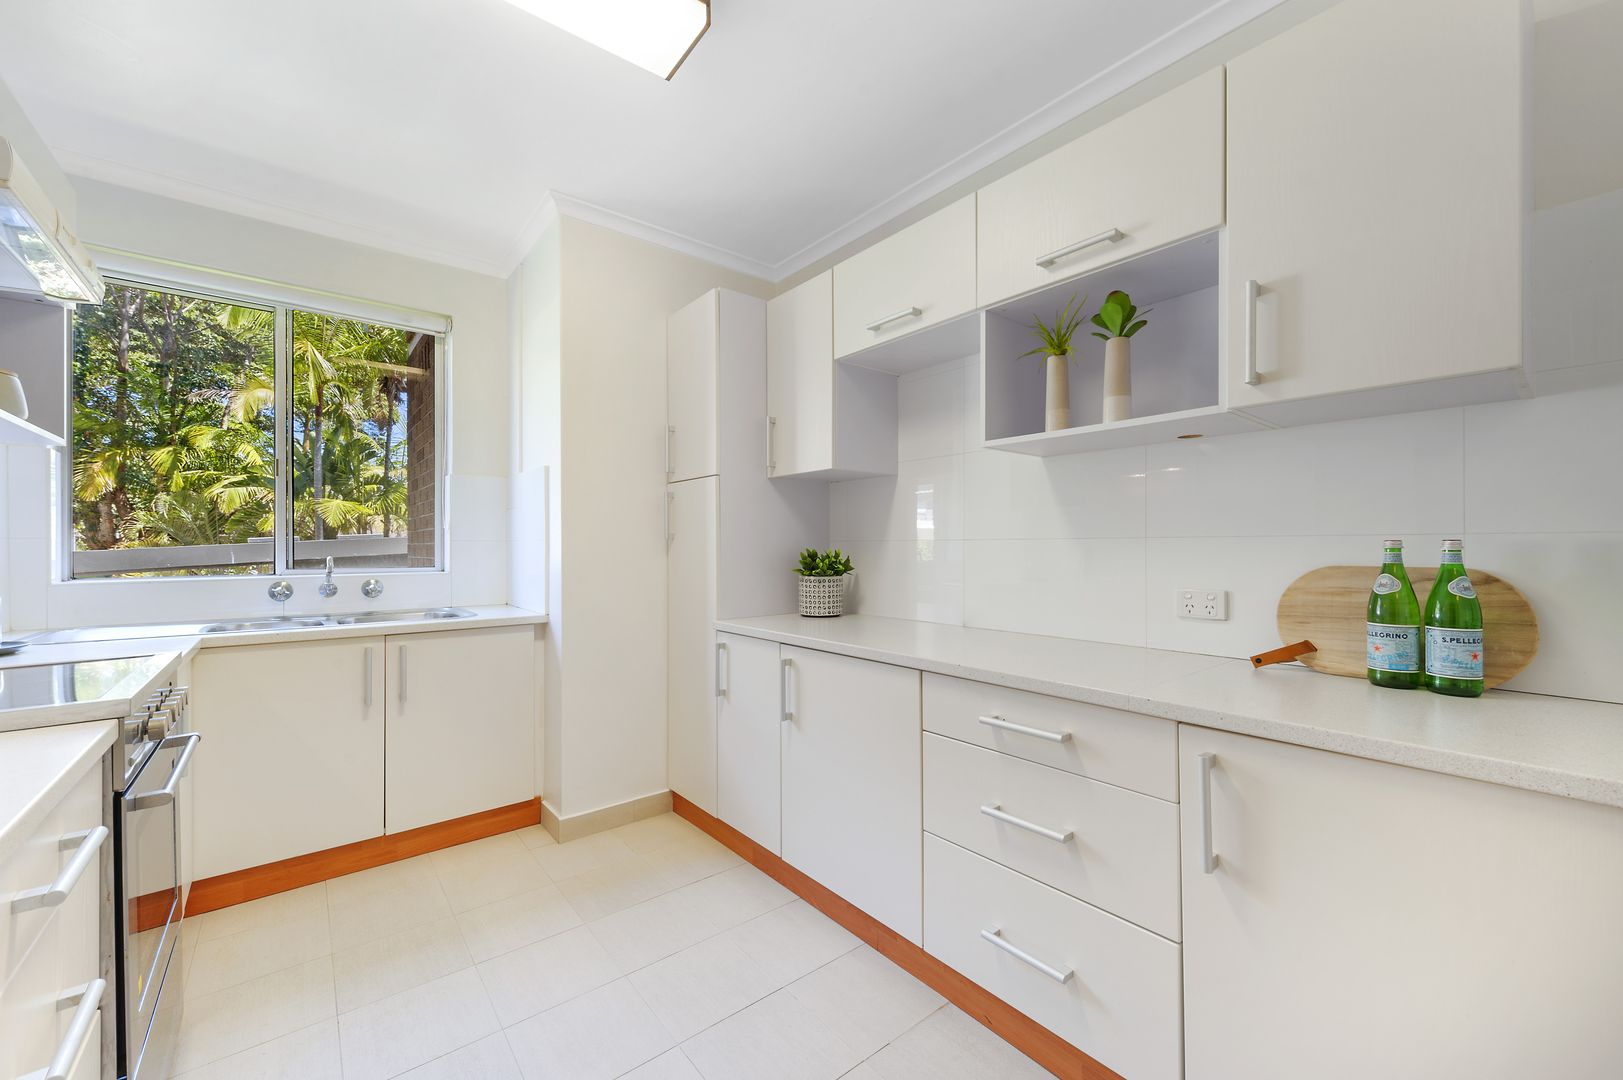 3/30 Drummoyne Avenue, Drummoyne NSW 2047, Image 2